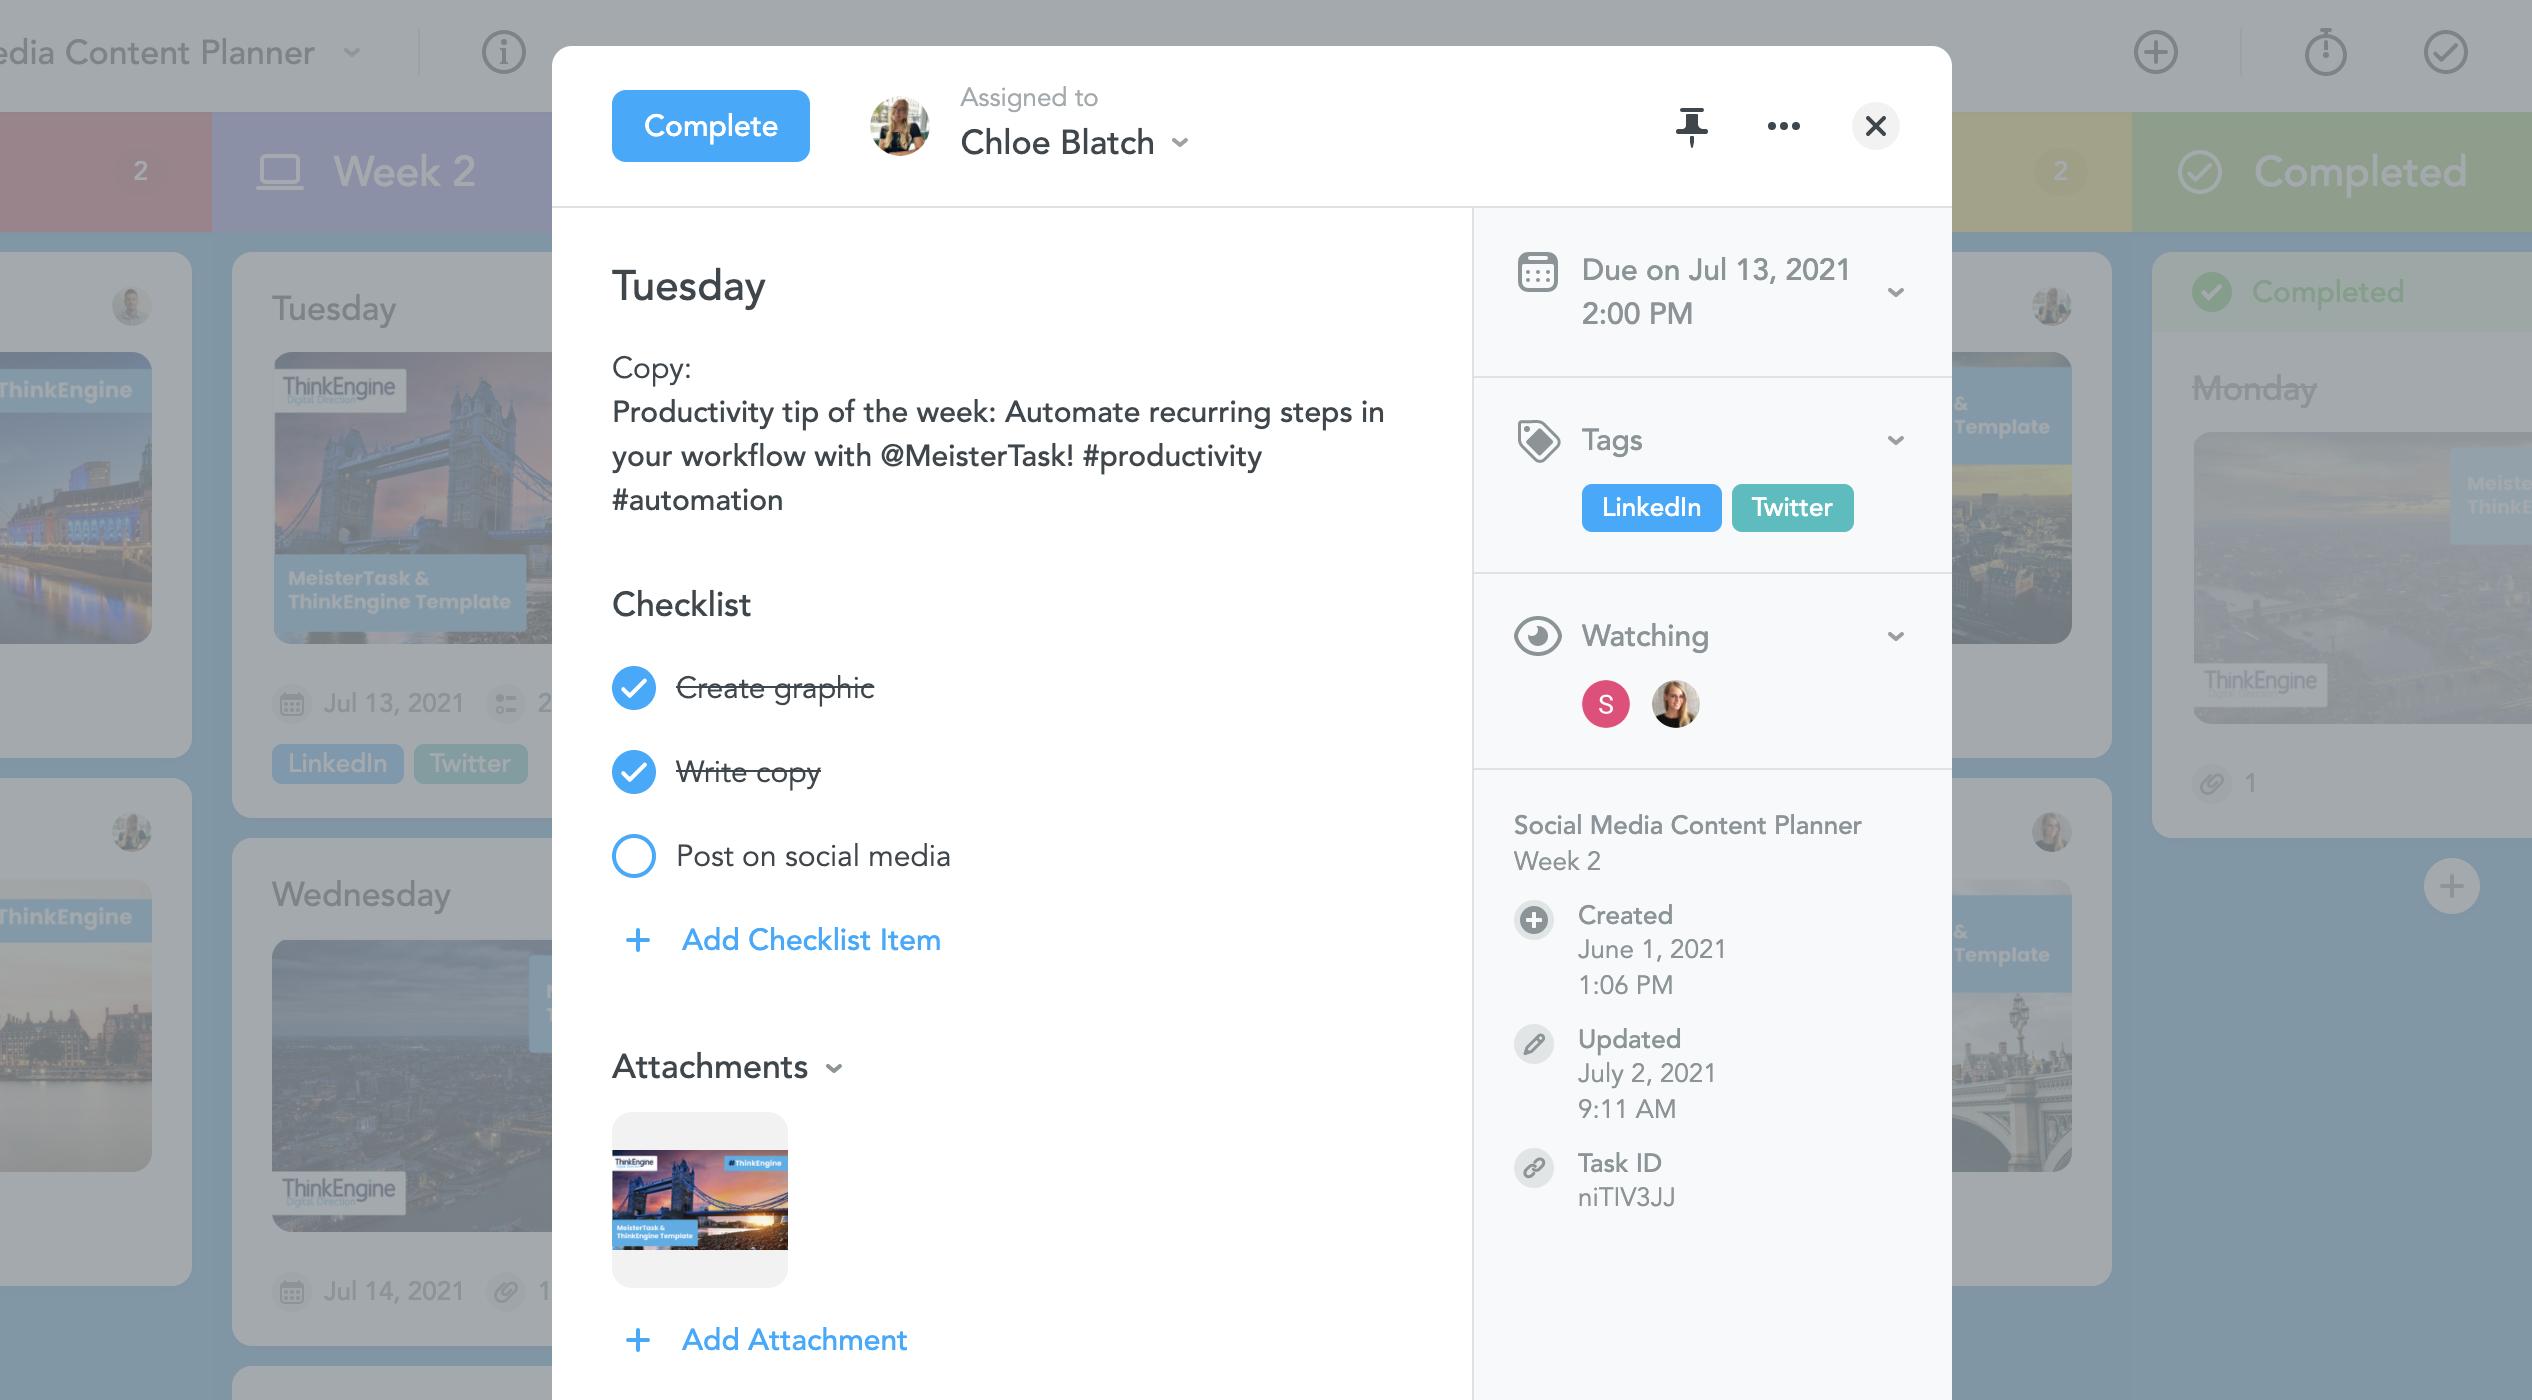 Social Media Post Task